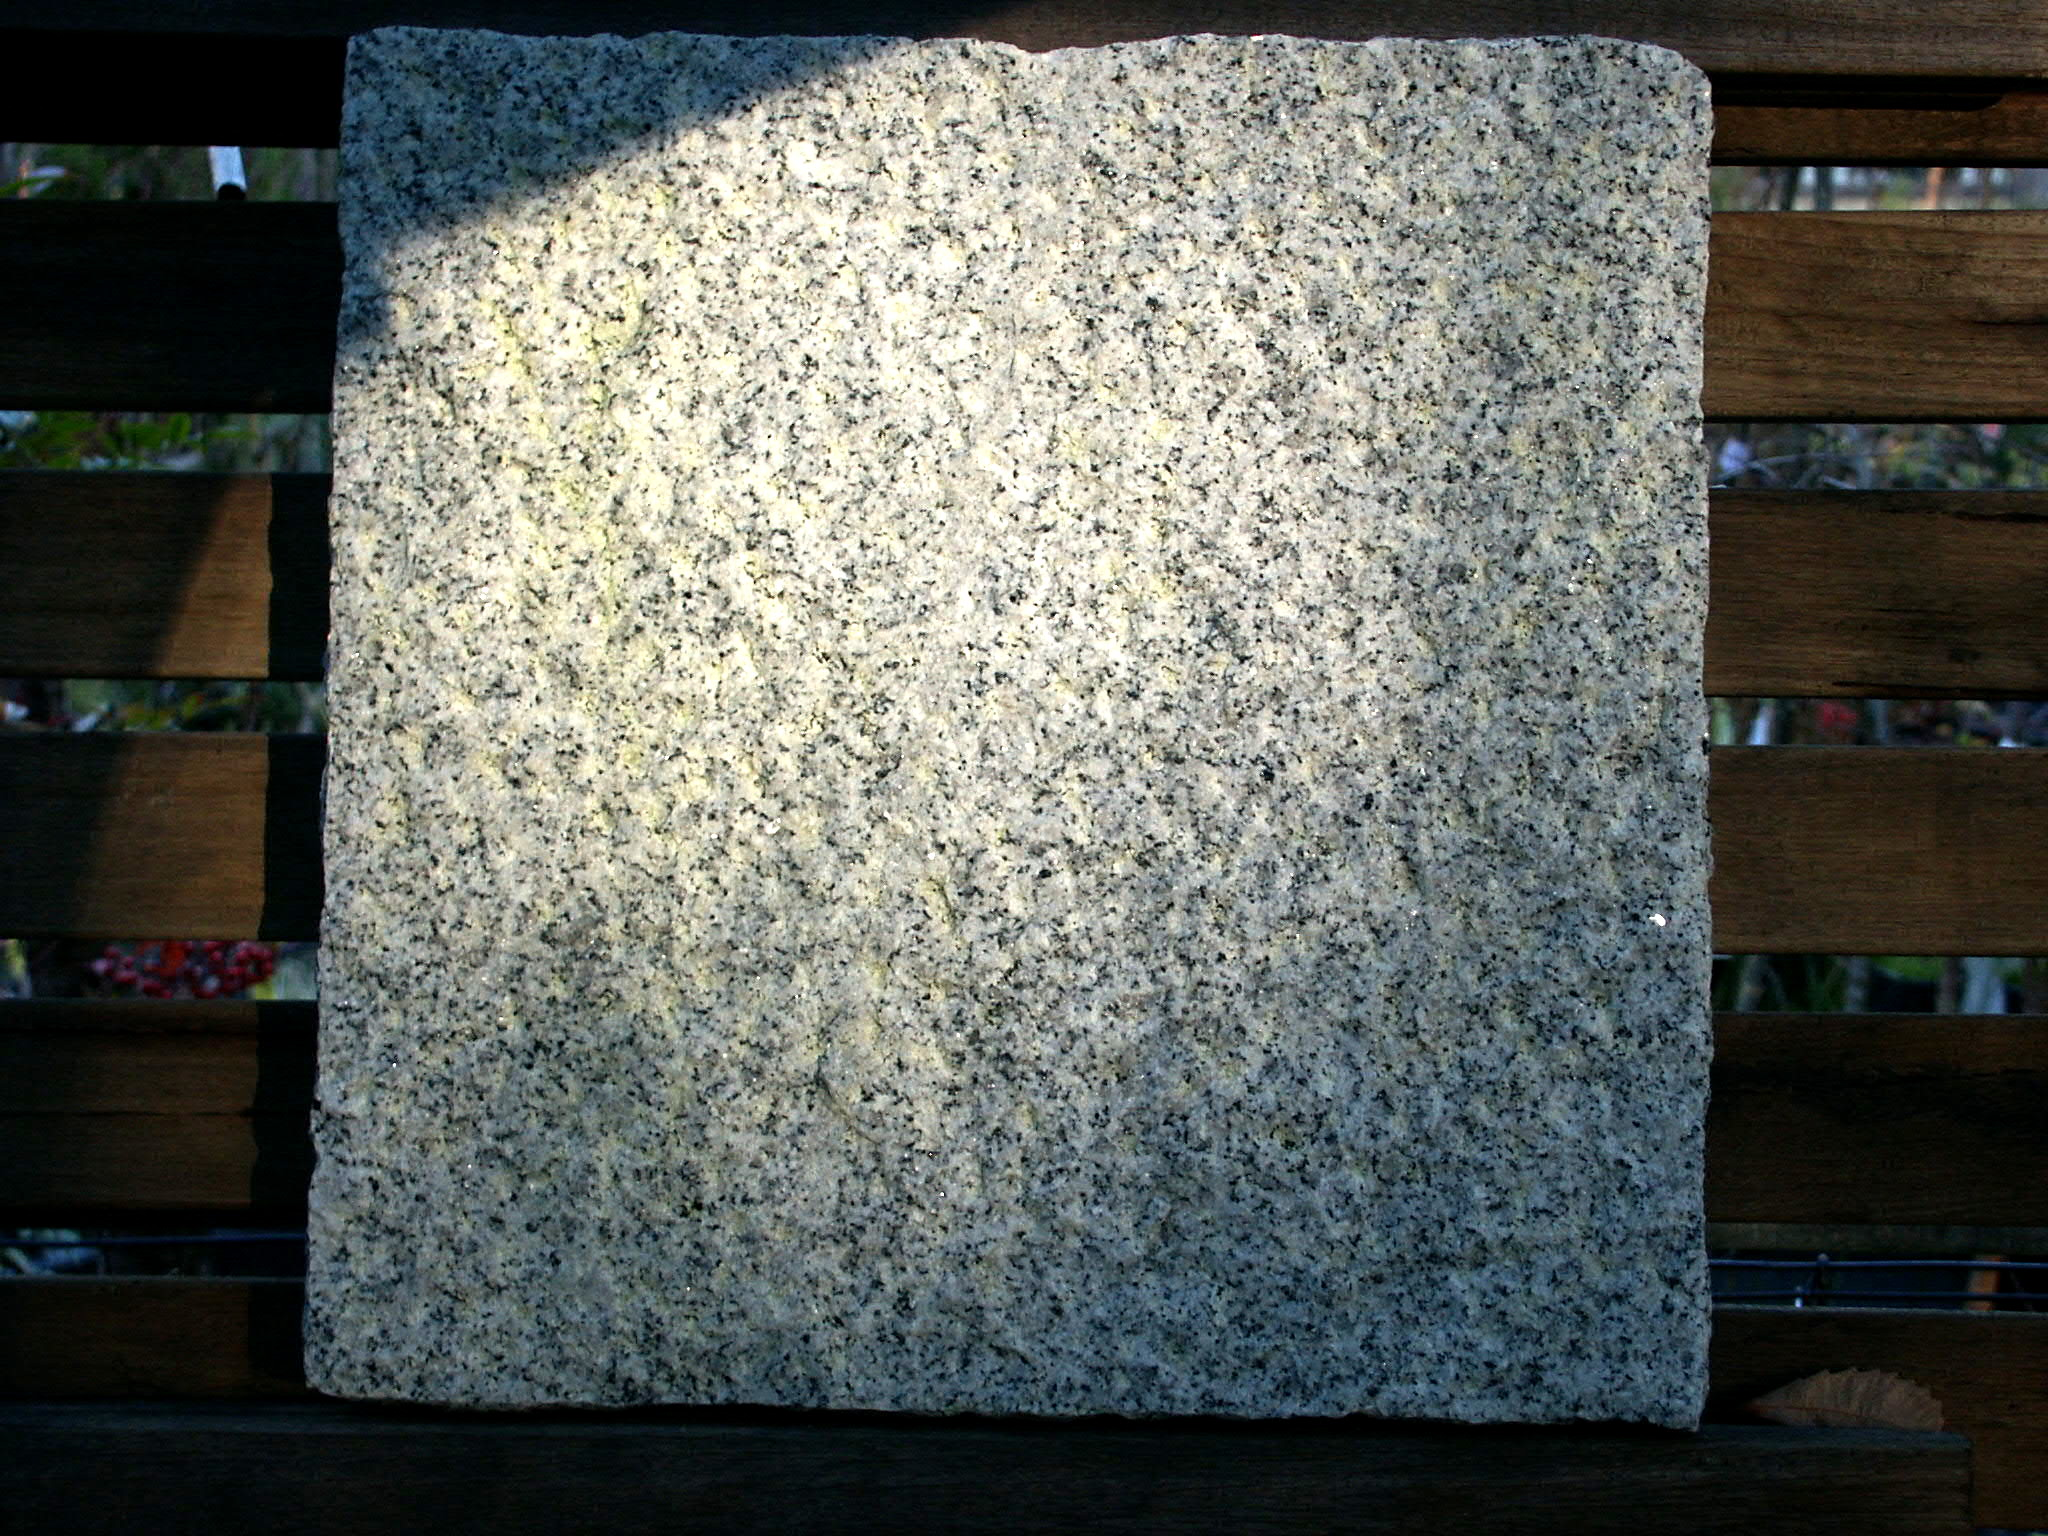 Paver Granite Large <br>120x30x6 $195 <br>150x30x6 $195 <br>120x45x6 $195 <br>150x45x6 $195